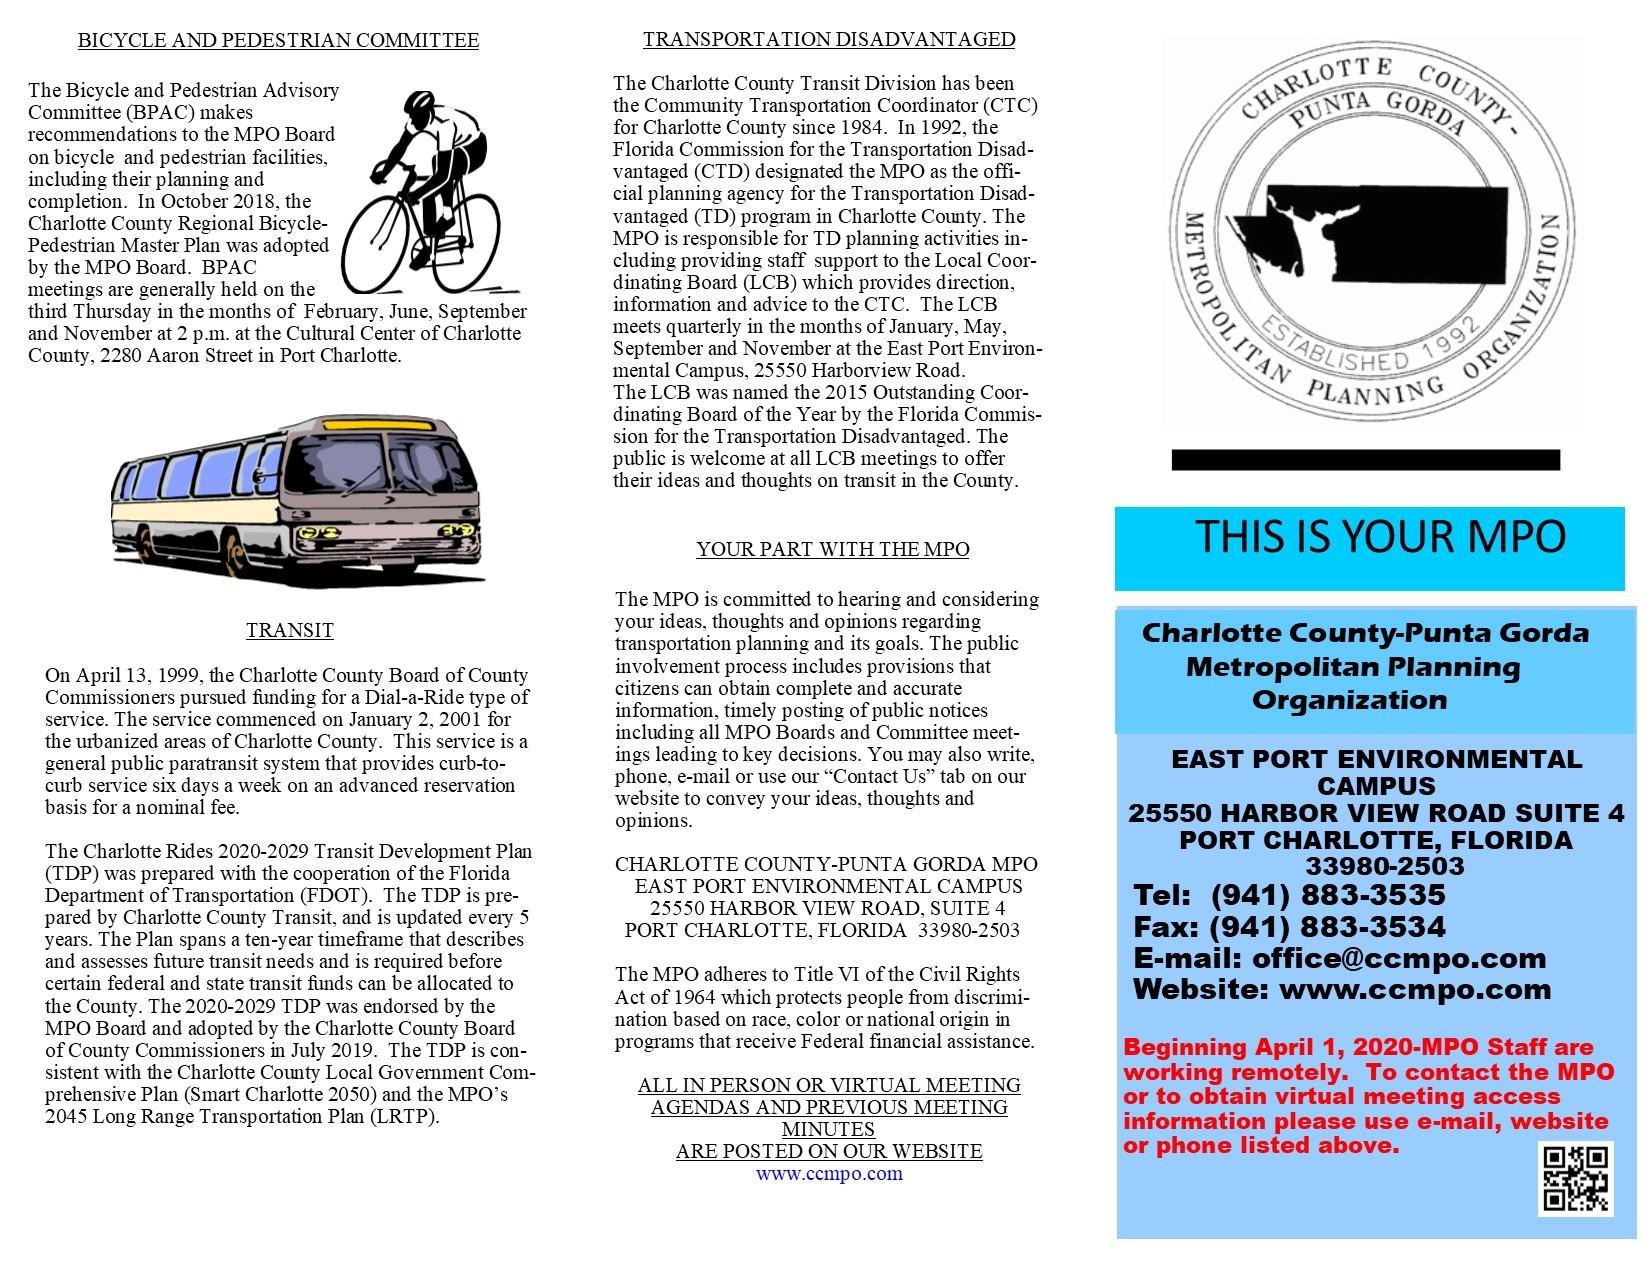 MPO Brochure page 1